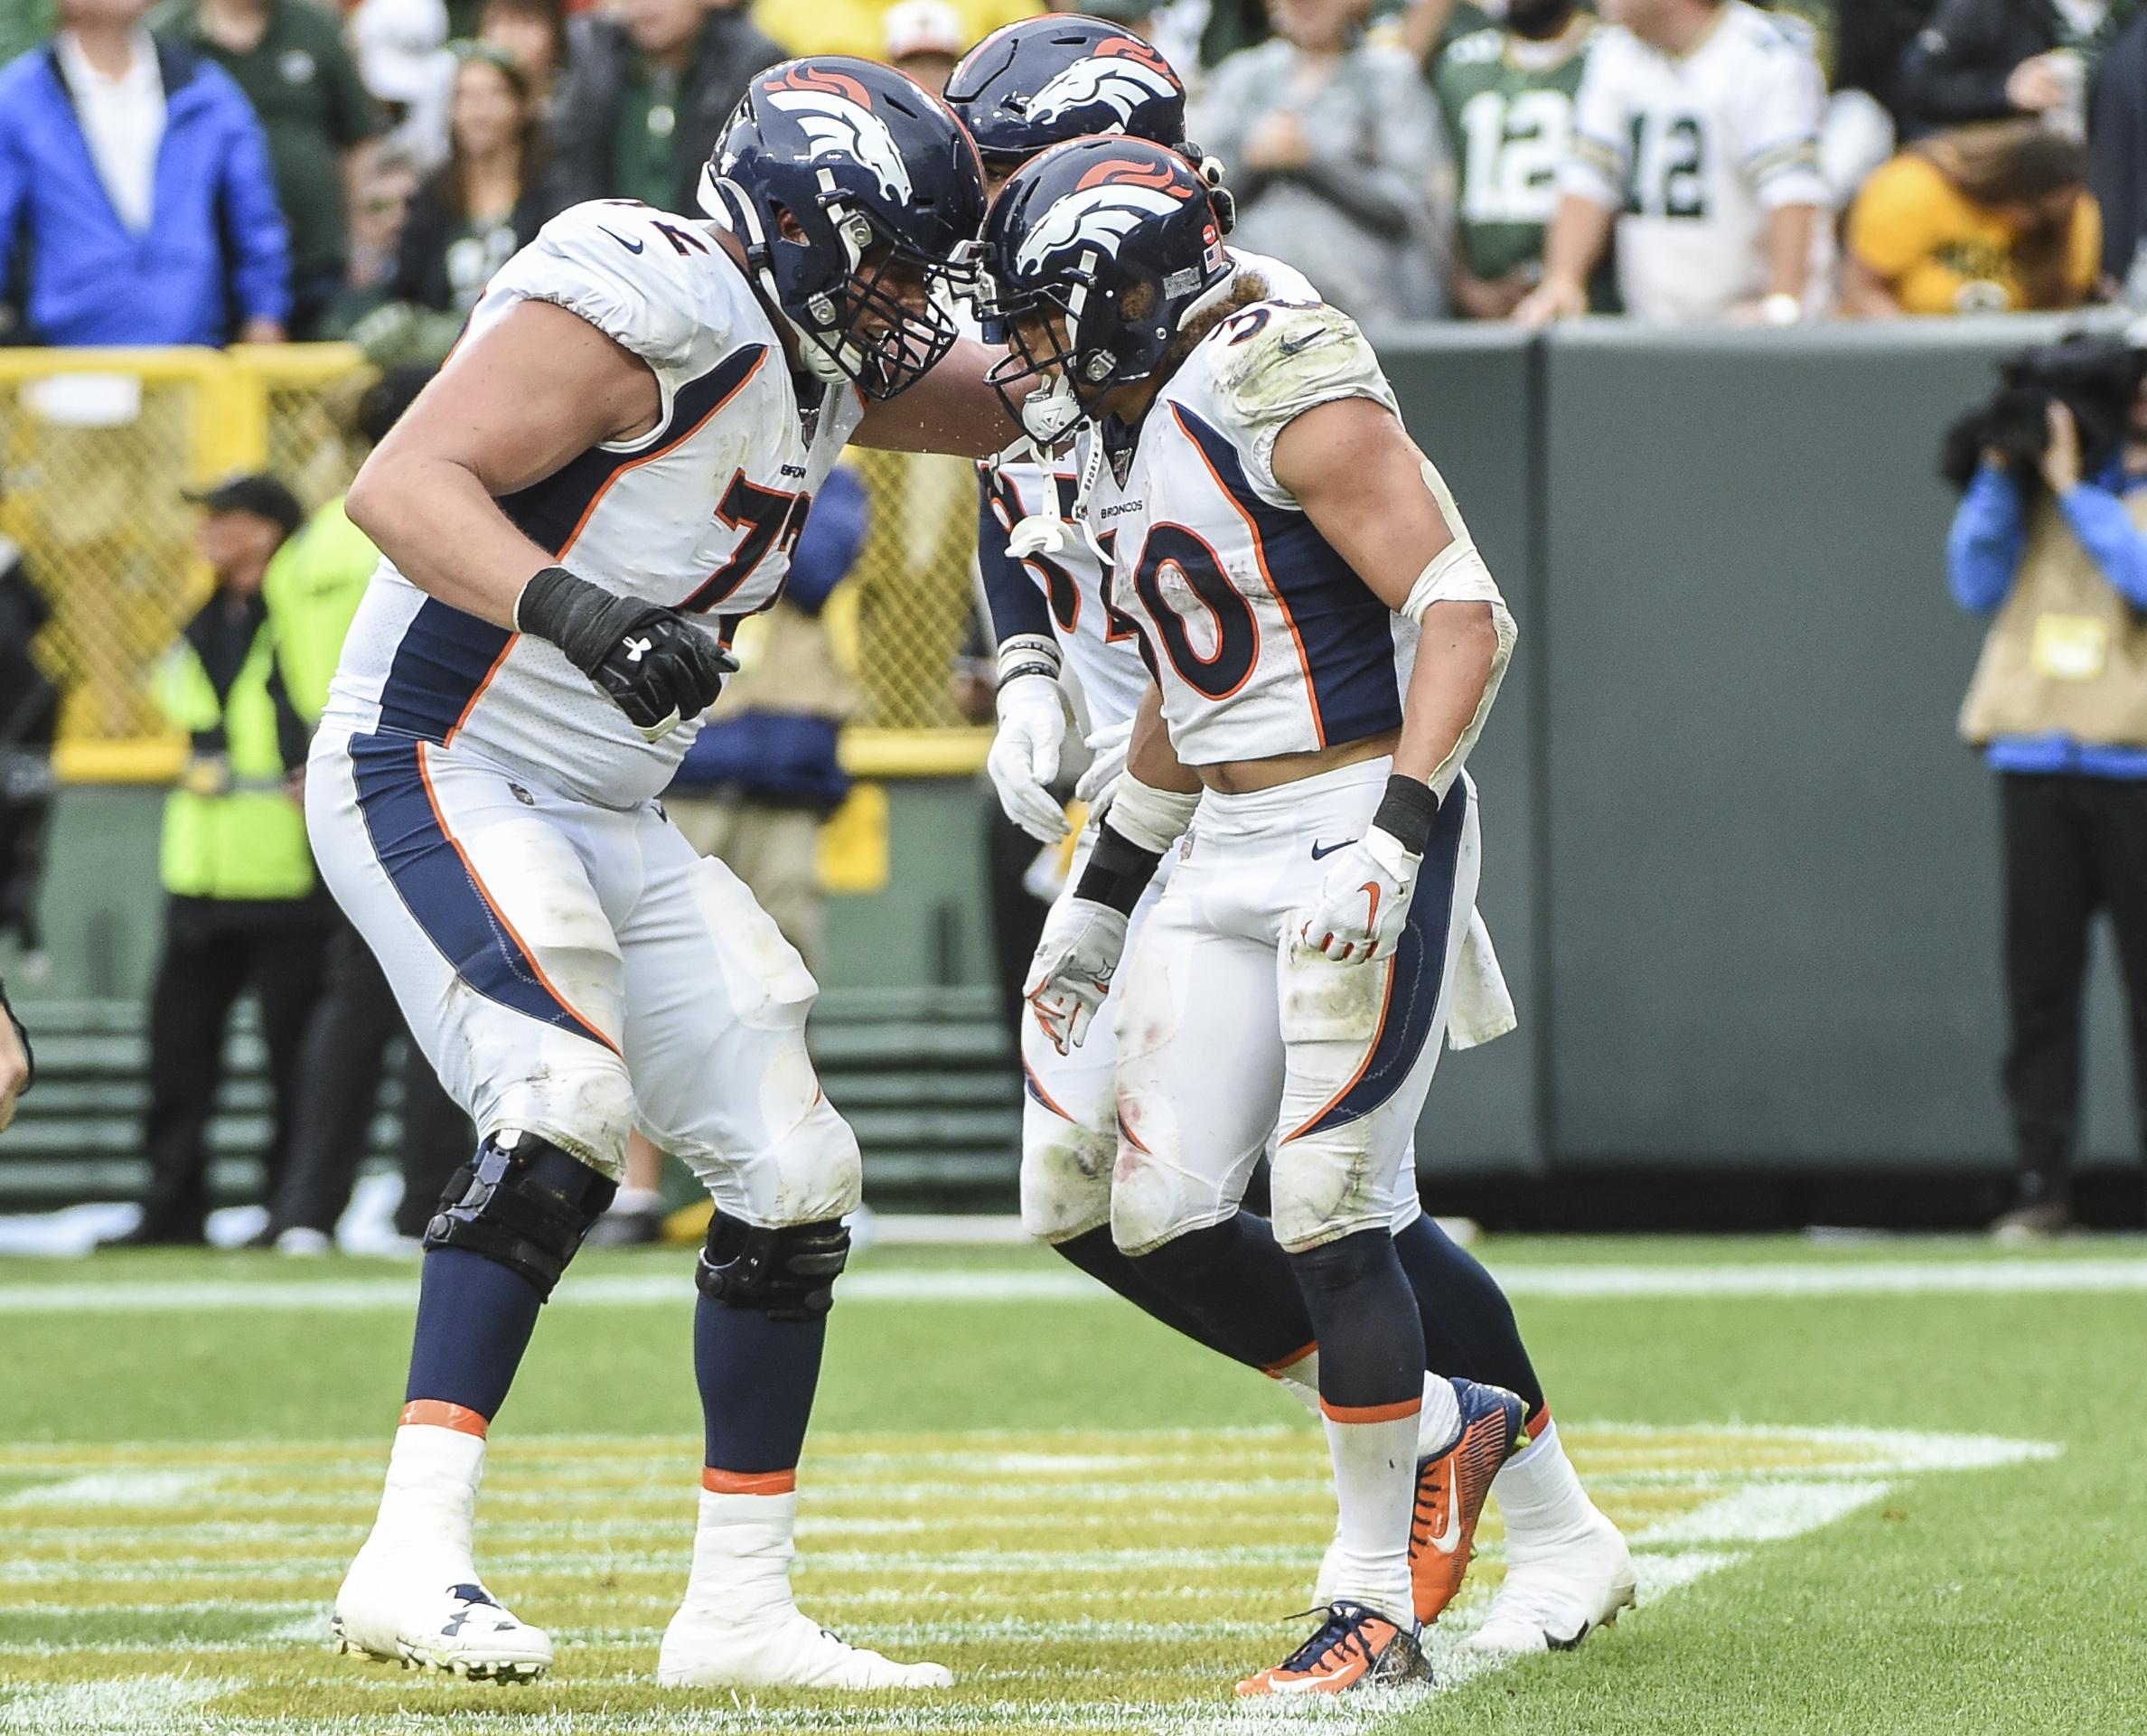 NFL: Denver Broncos at Green Bay Packers